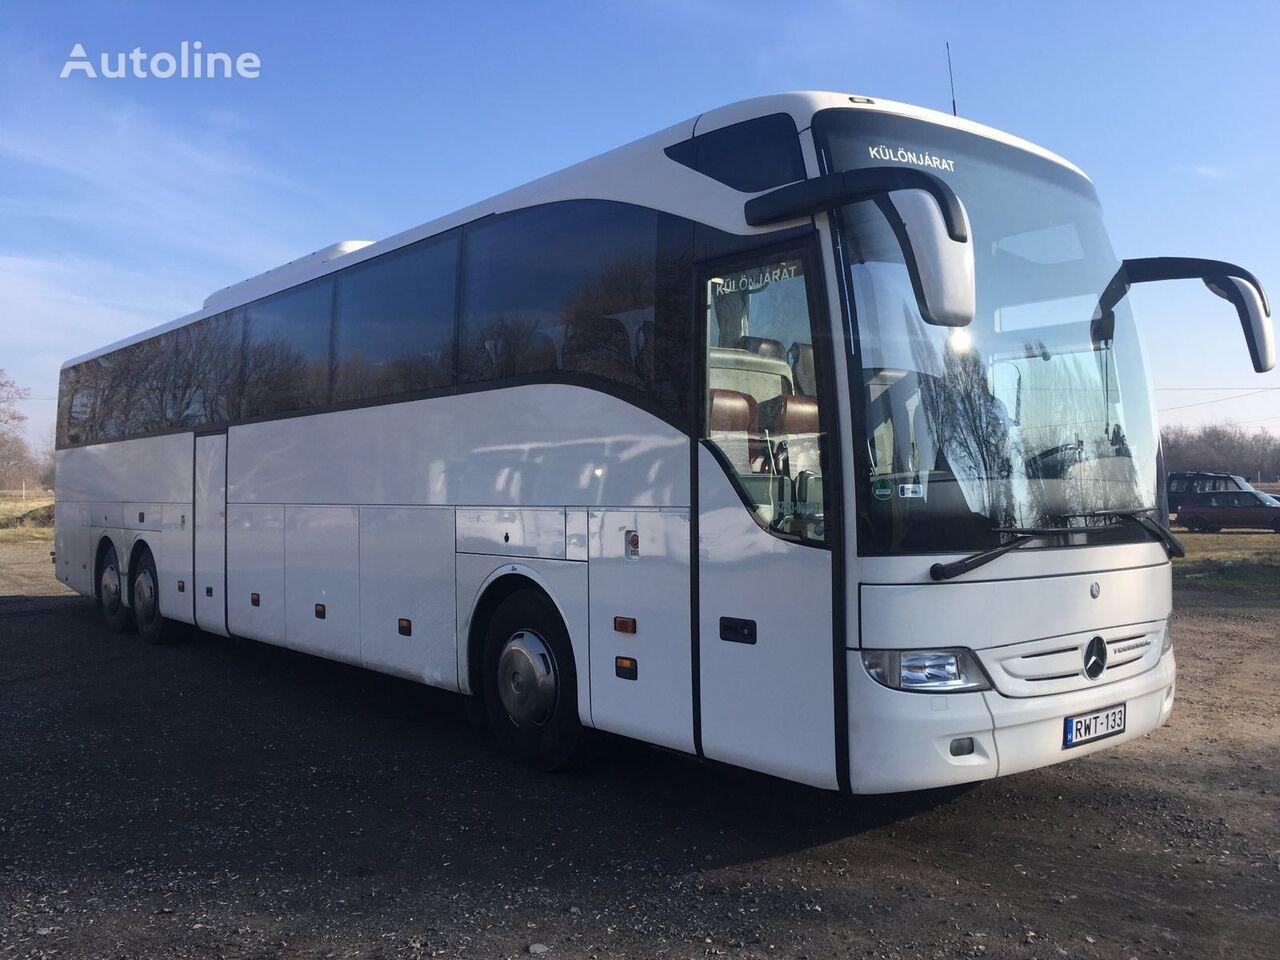 MERCEDES-BENZ Tourismo 17 RHD coach bus